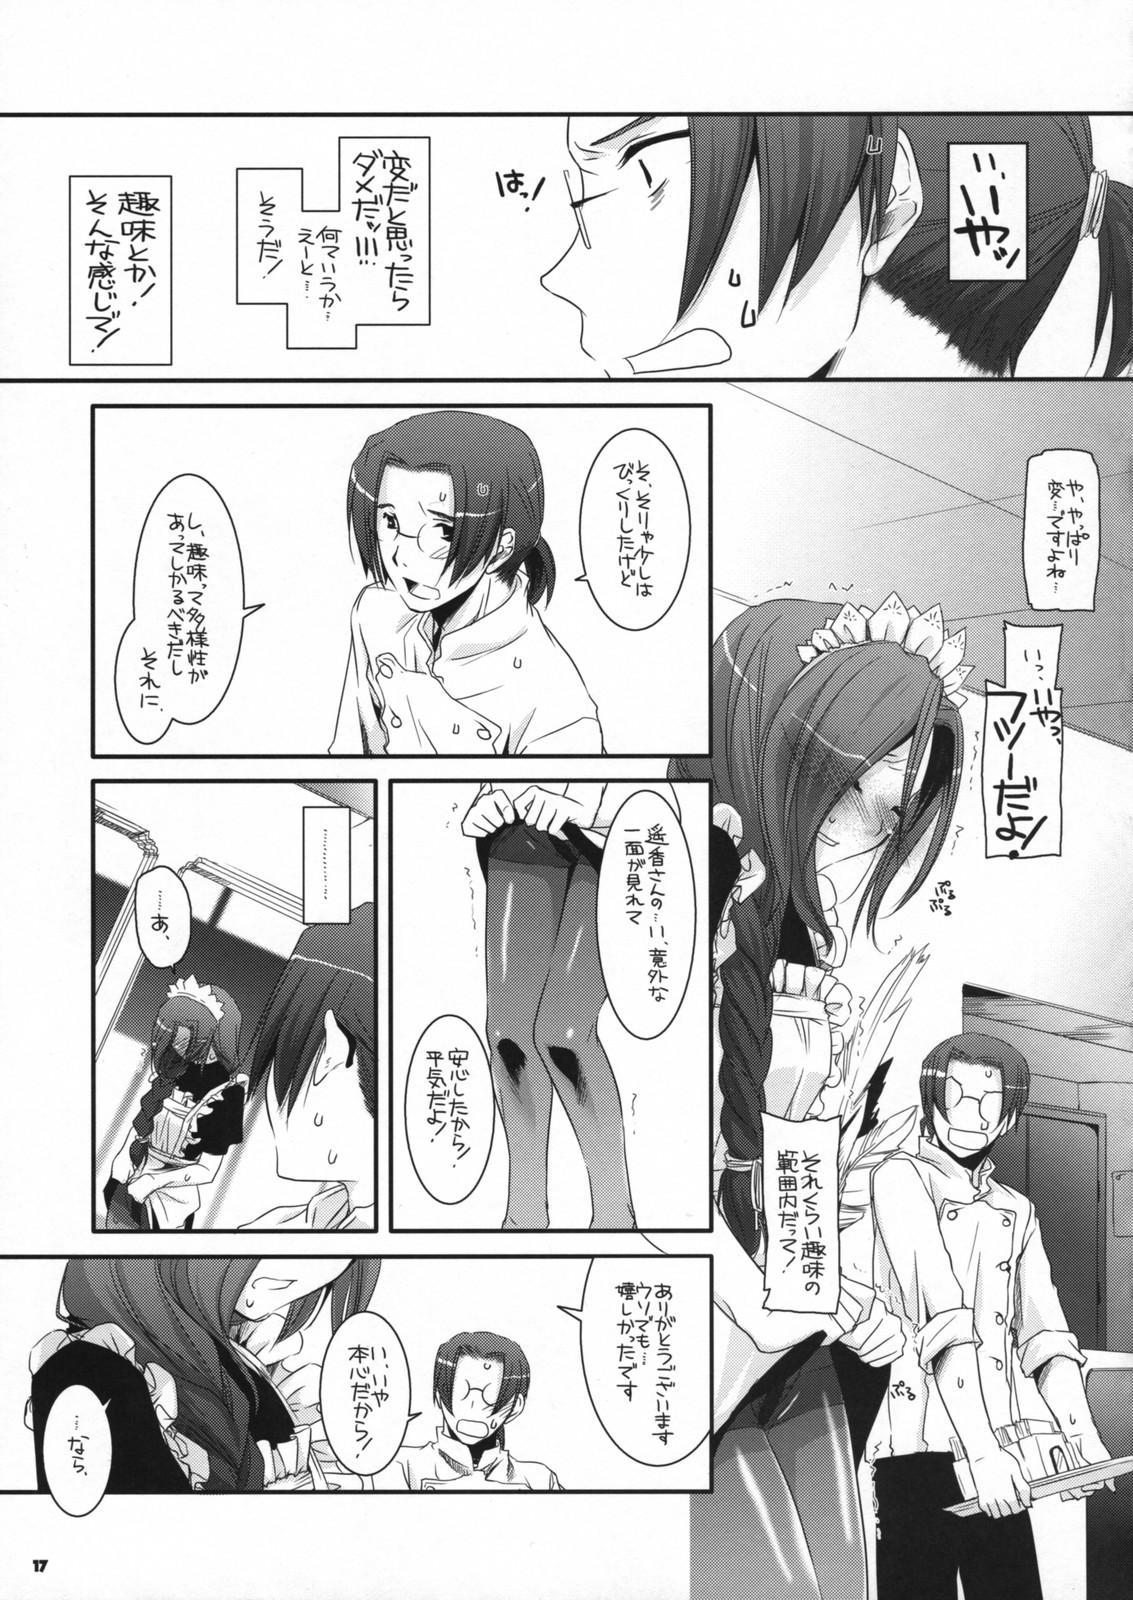 Seifuku Rakuen 21 - Costume Paradise 21 15